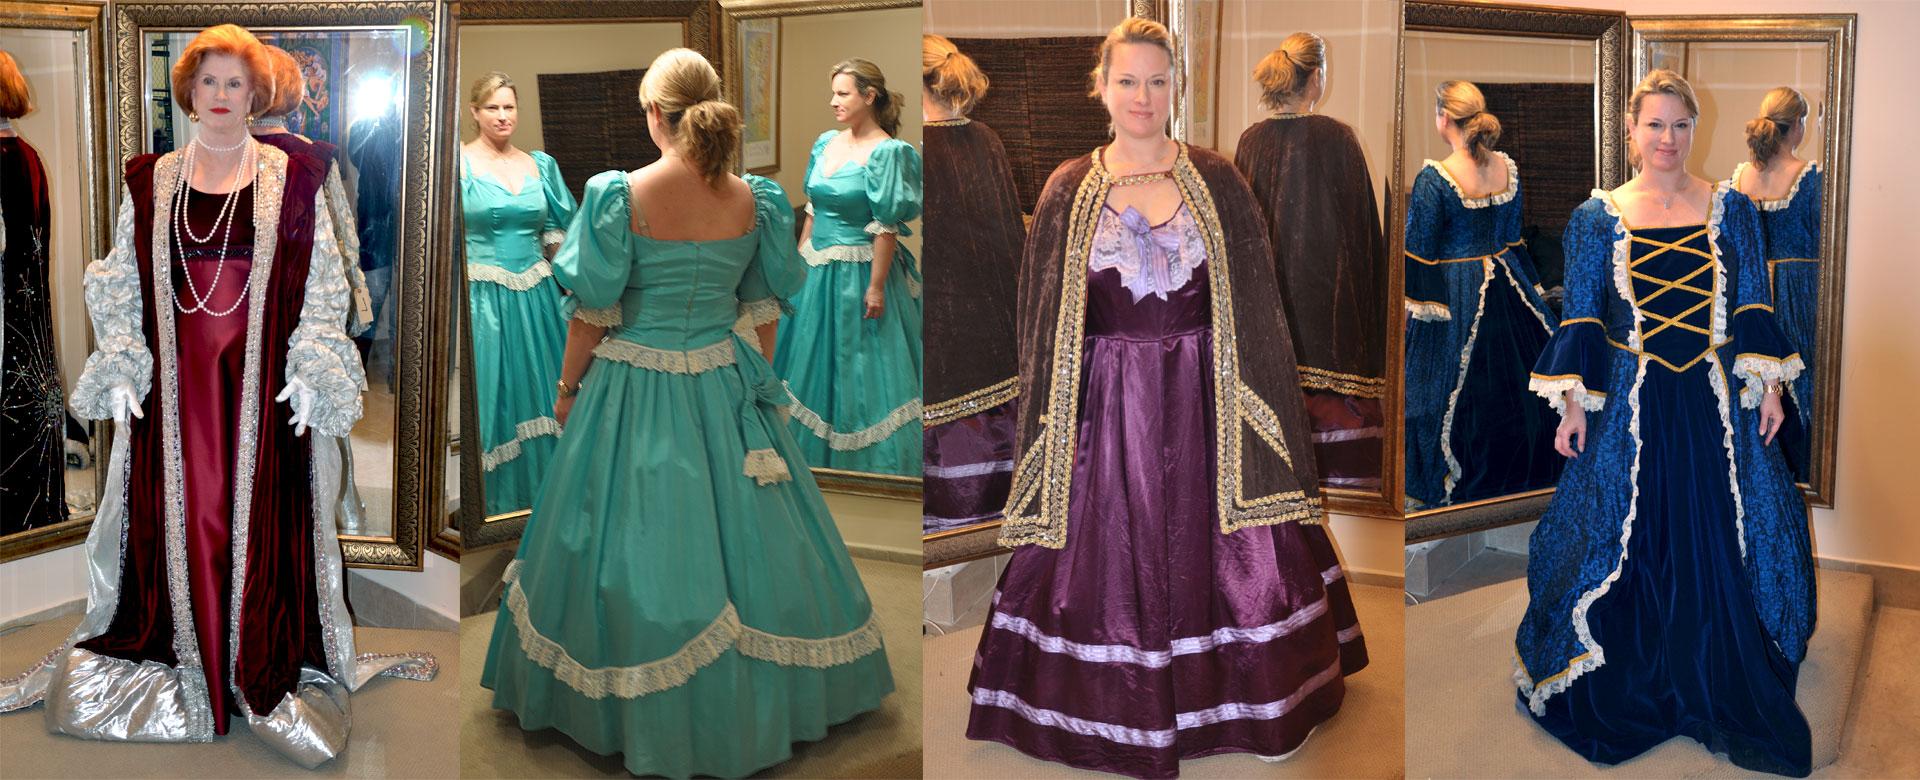 Antebellum Dresses - New Orleans Costume Company